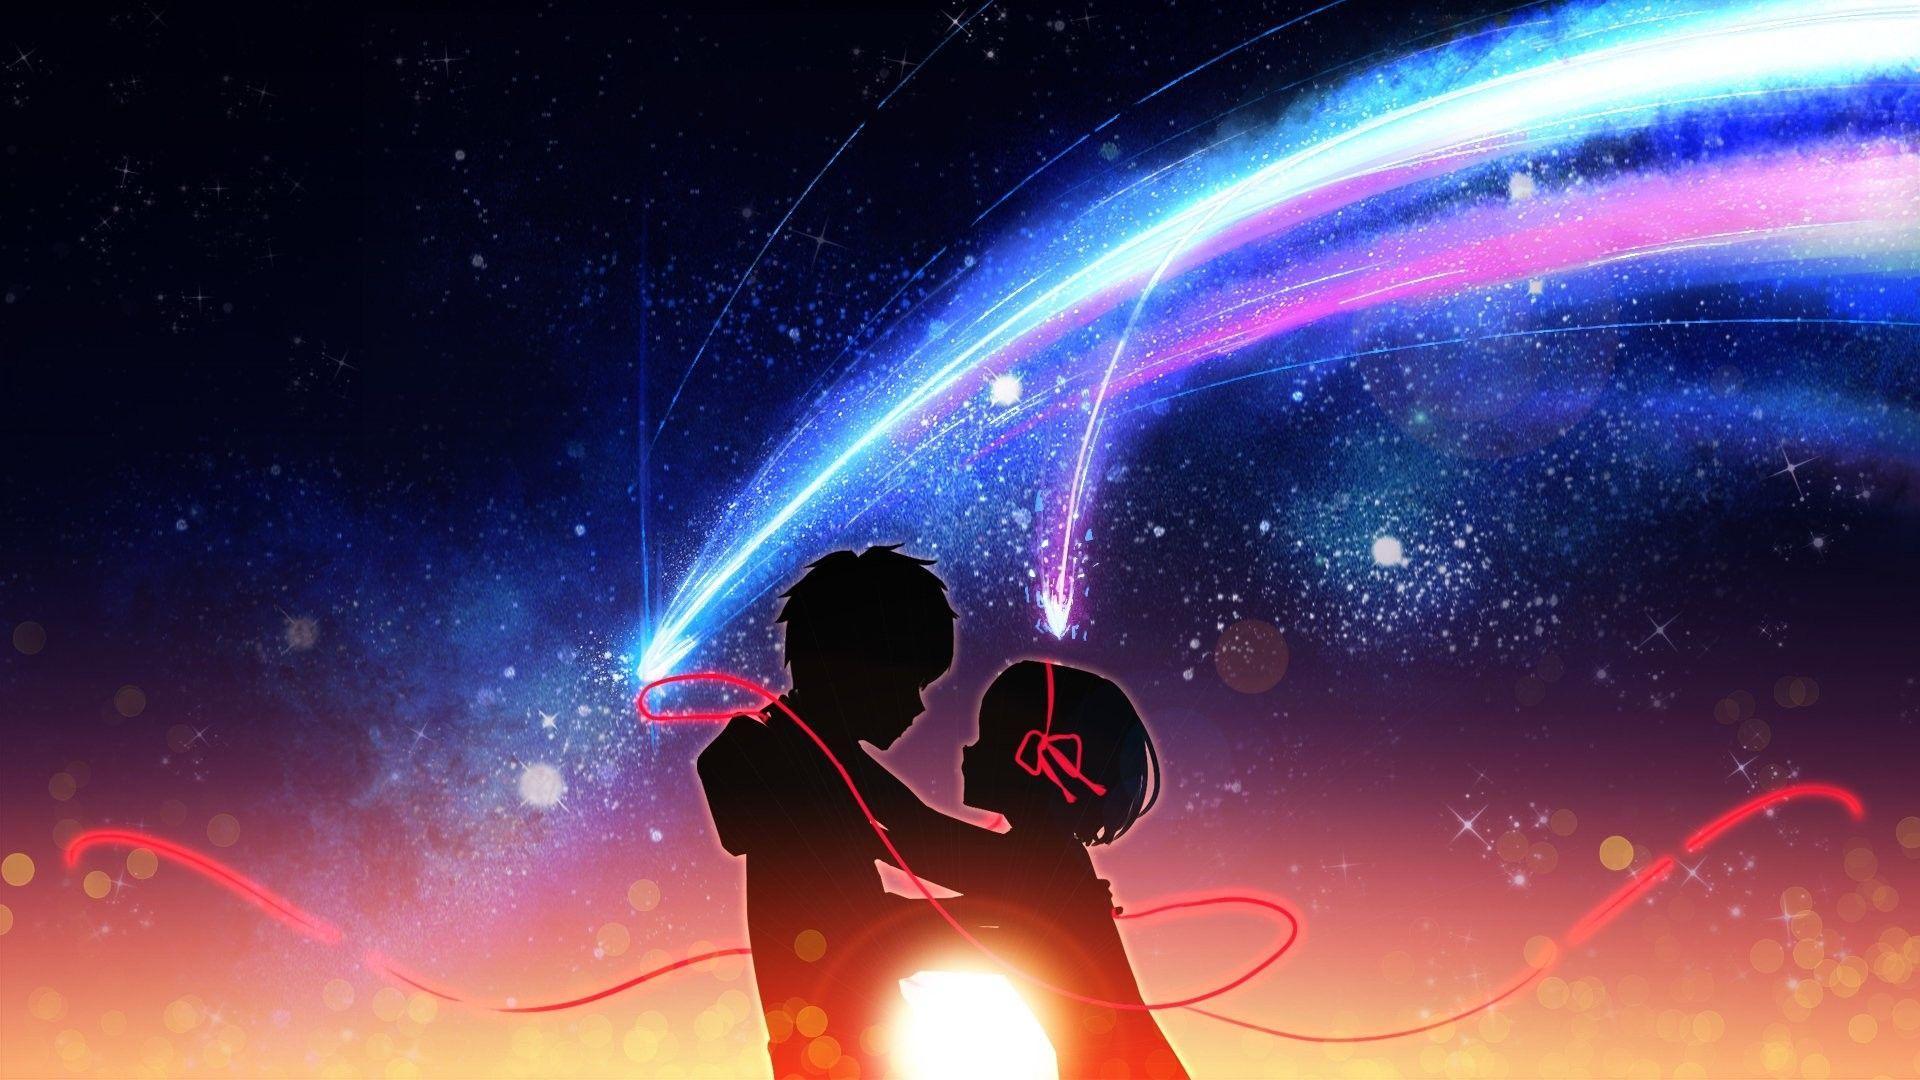 Anime Your Name Live Wallpapers Top Free Anime Your Name Live